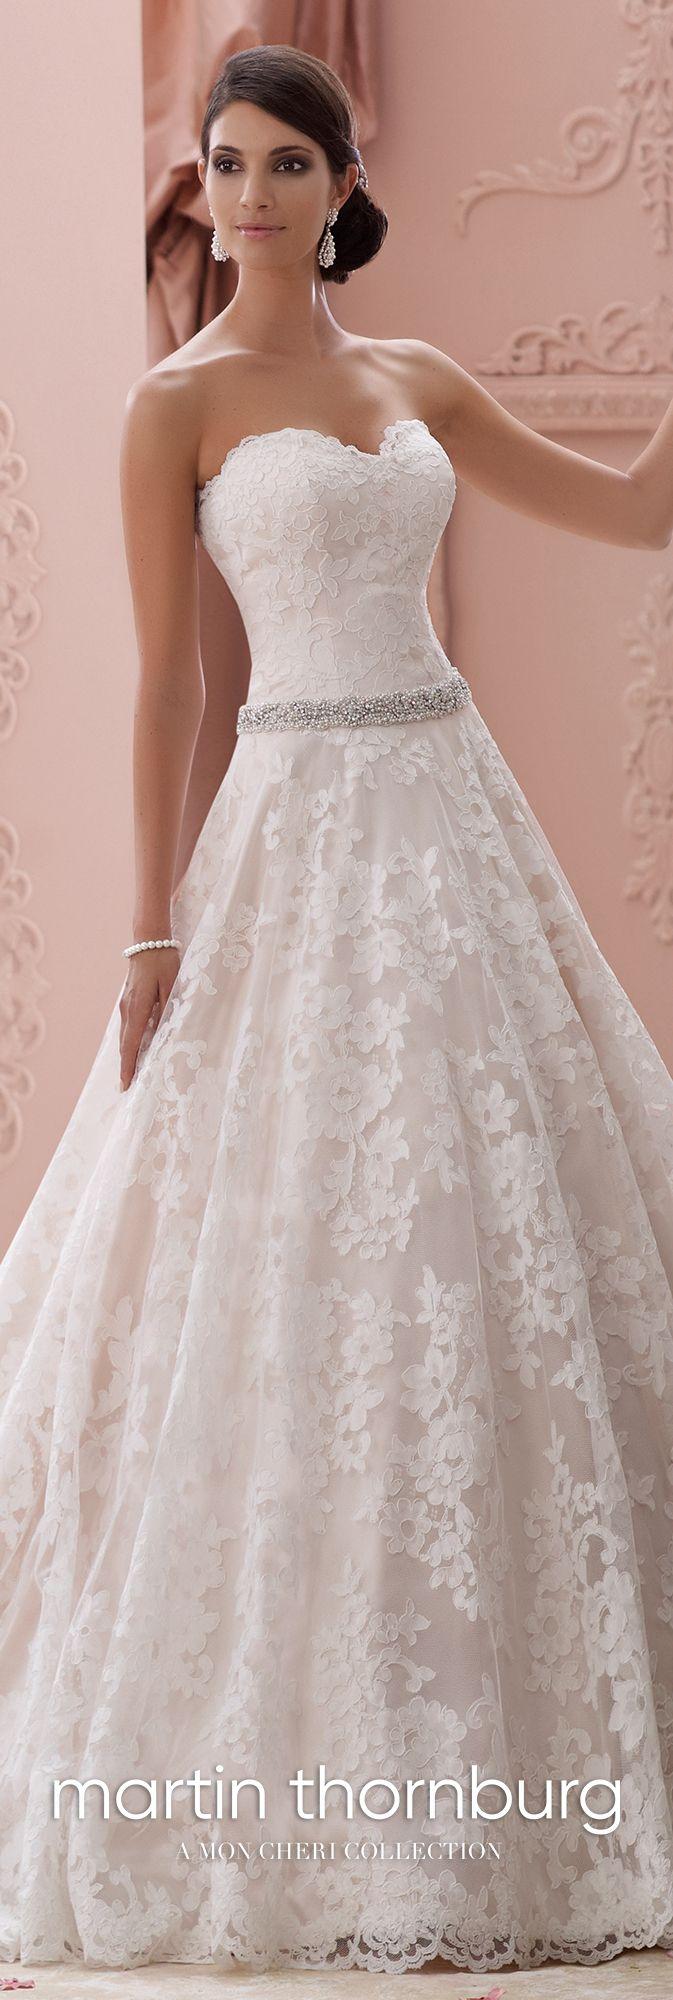 Strapless lace u jeweledbelt ball gown wedding dress suri